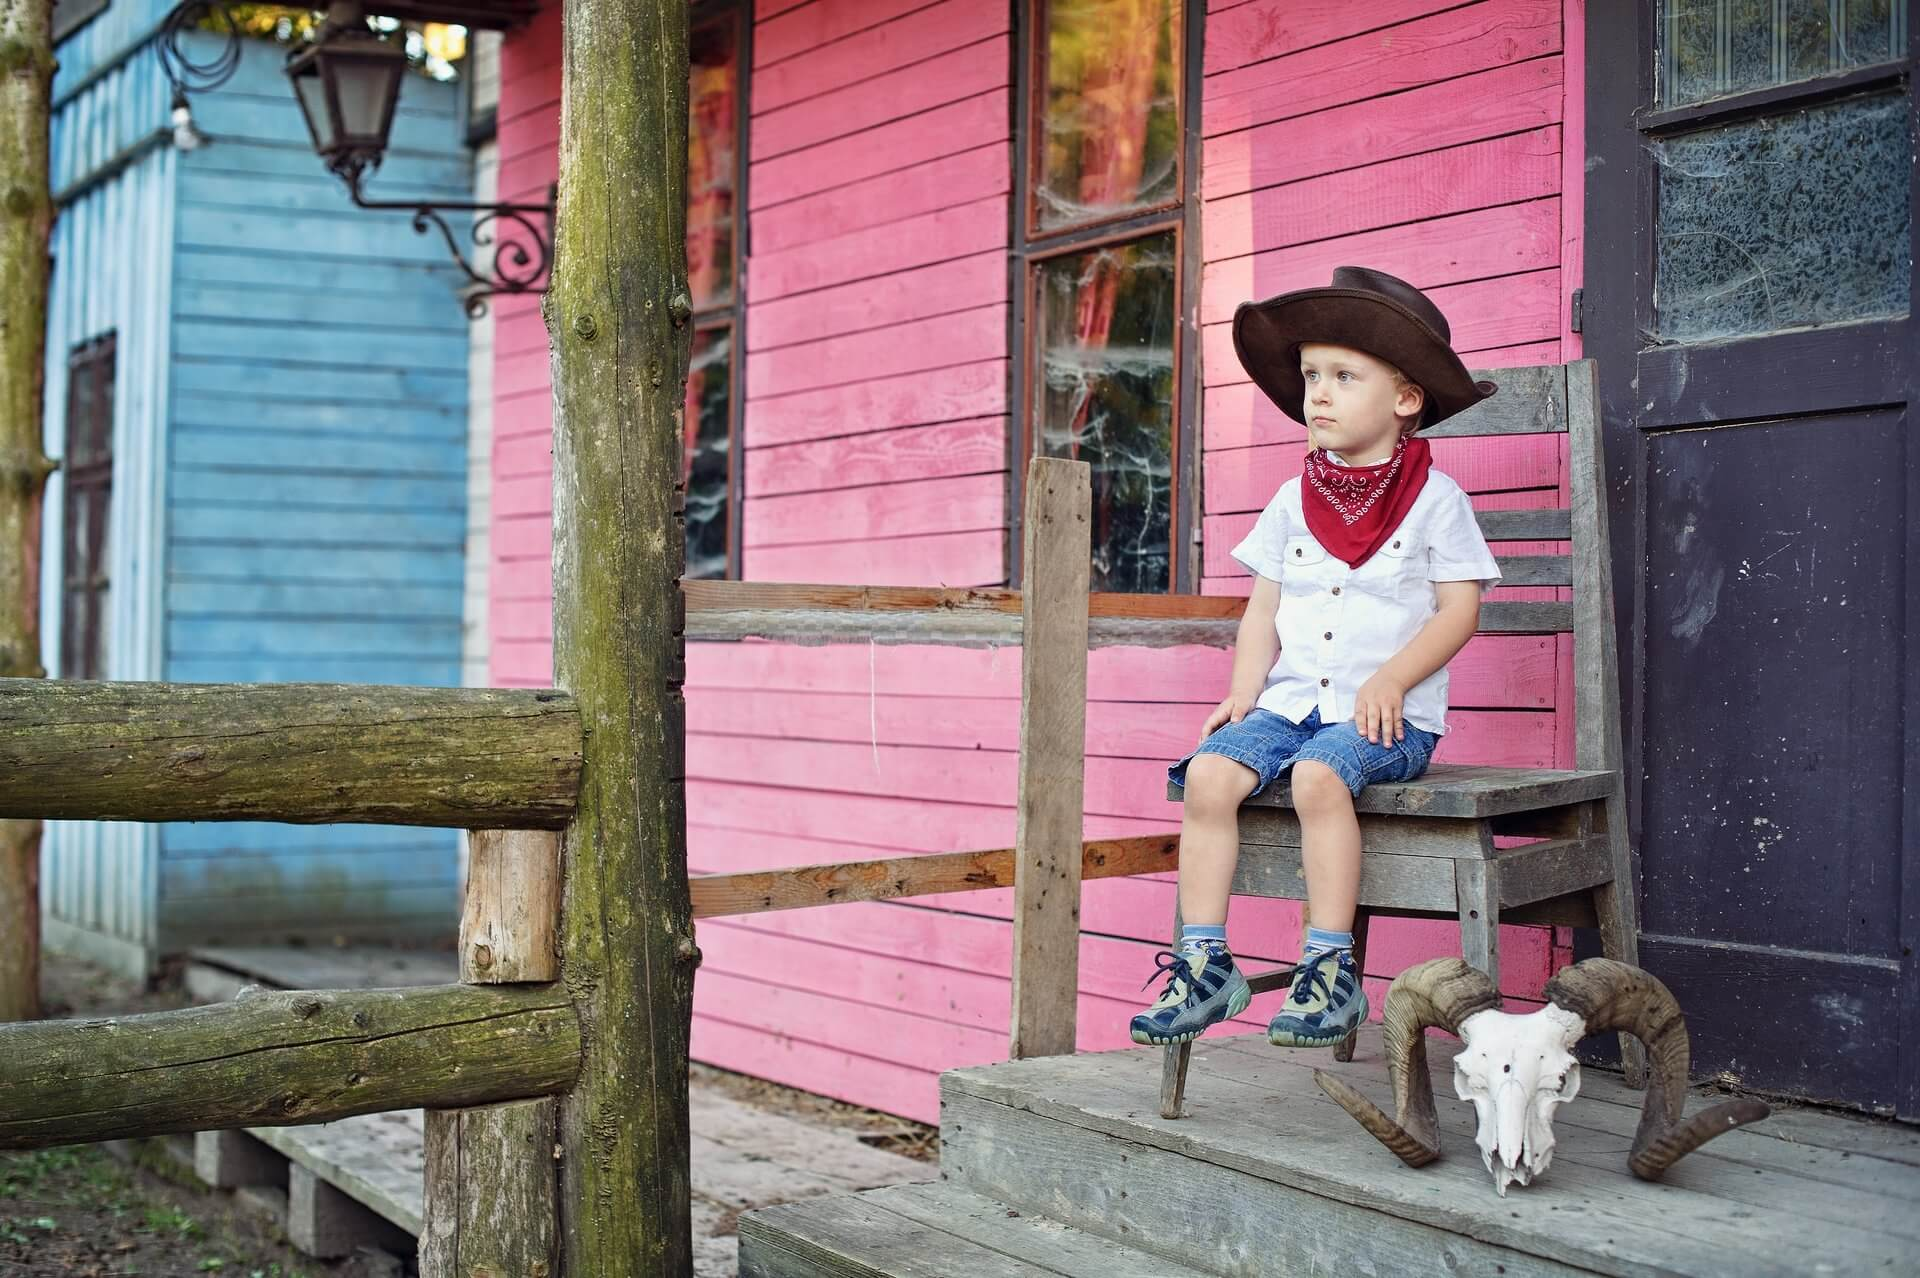 profesionalny fotograf Peter Norulak Kosice umelecke fotky deti exterier westernove mestecko kovboj_18